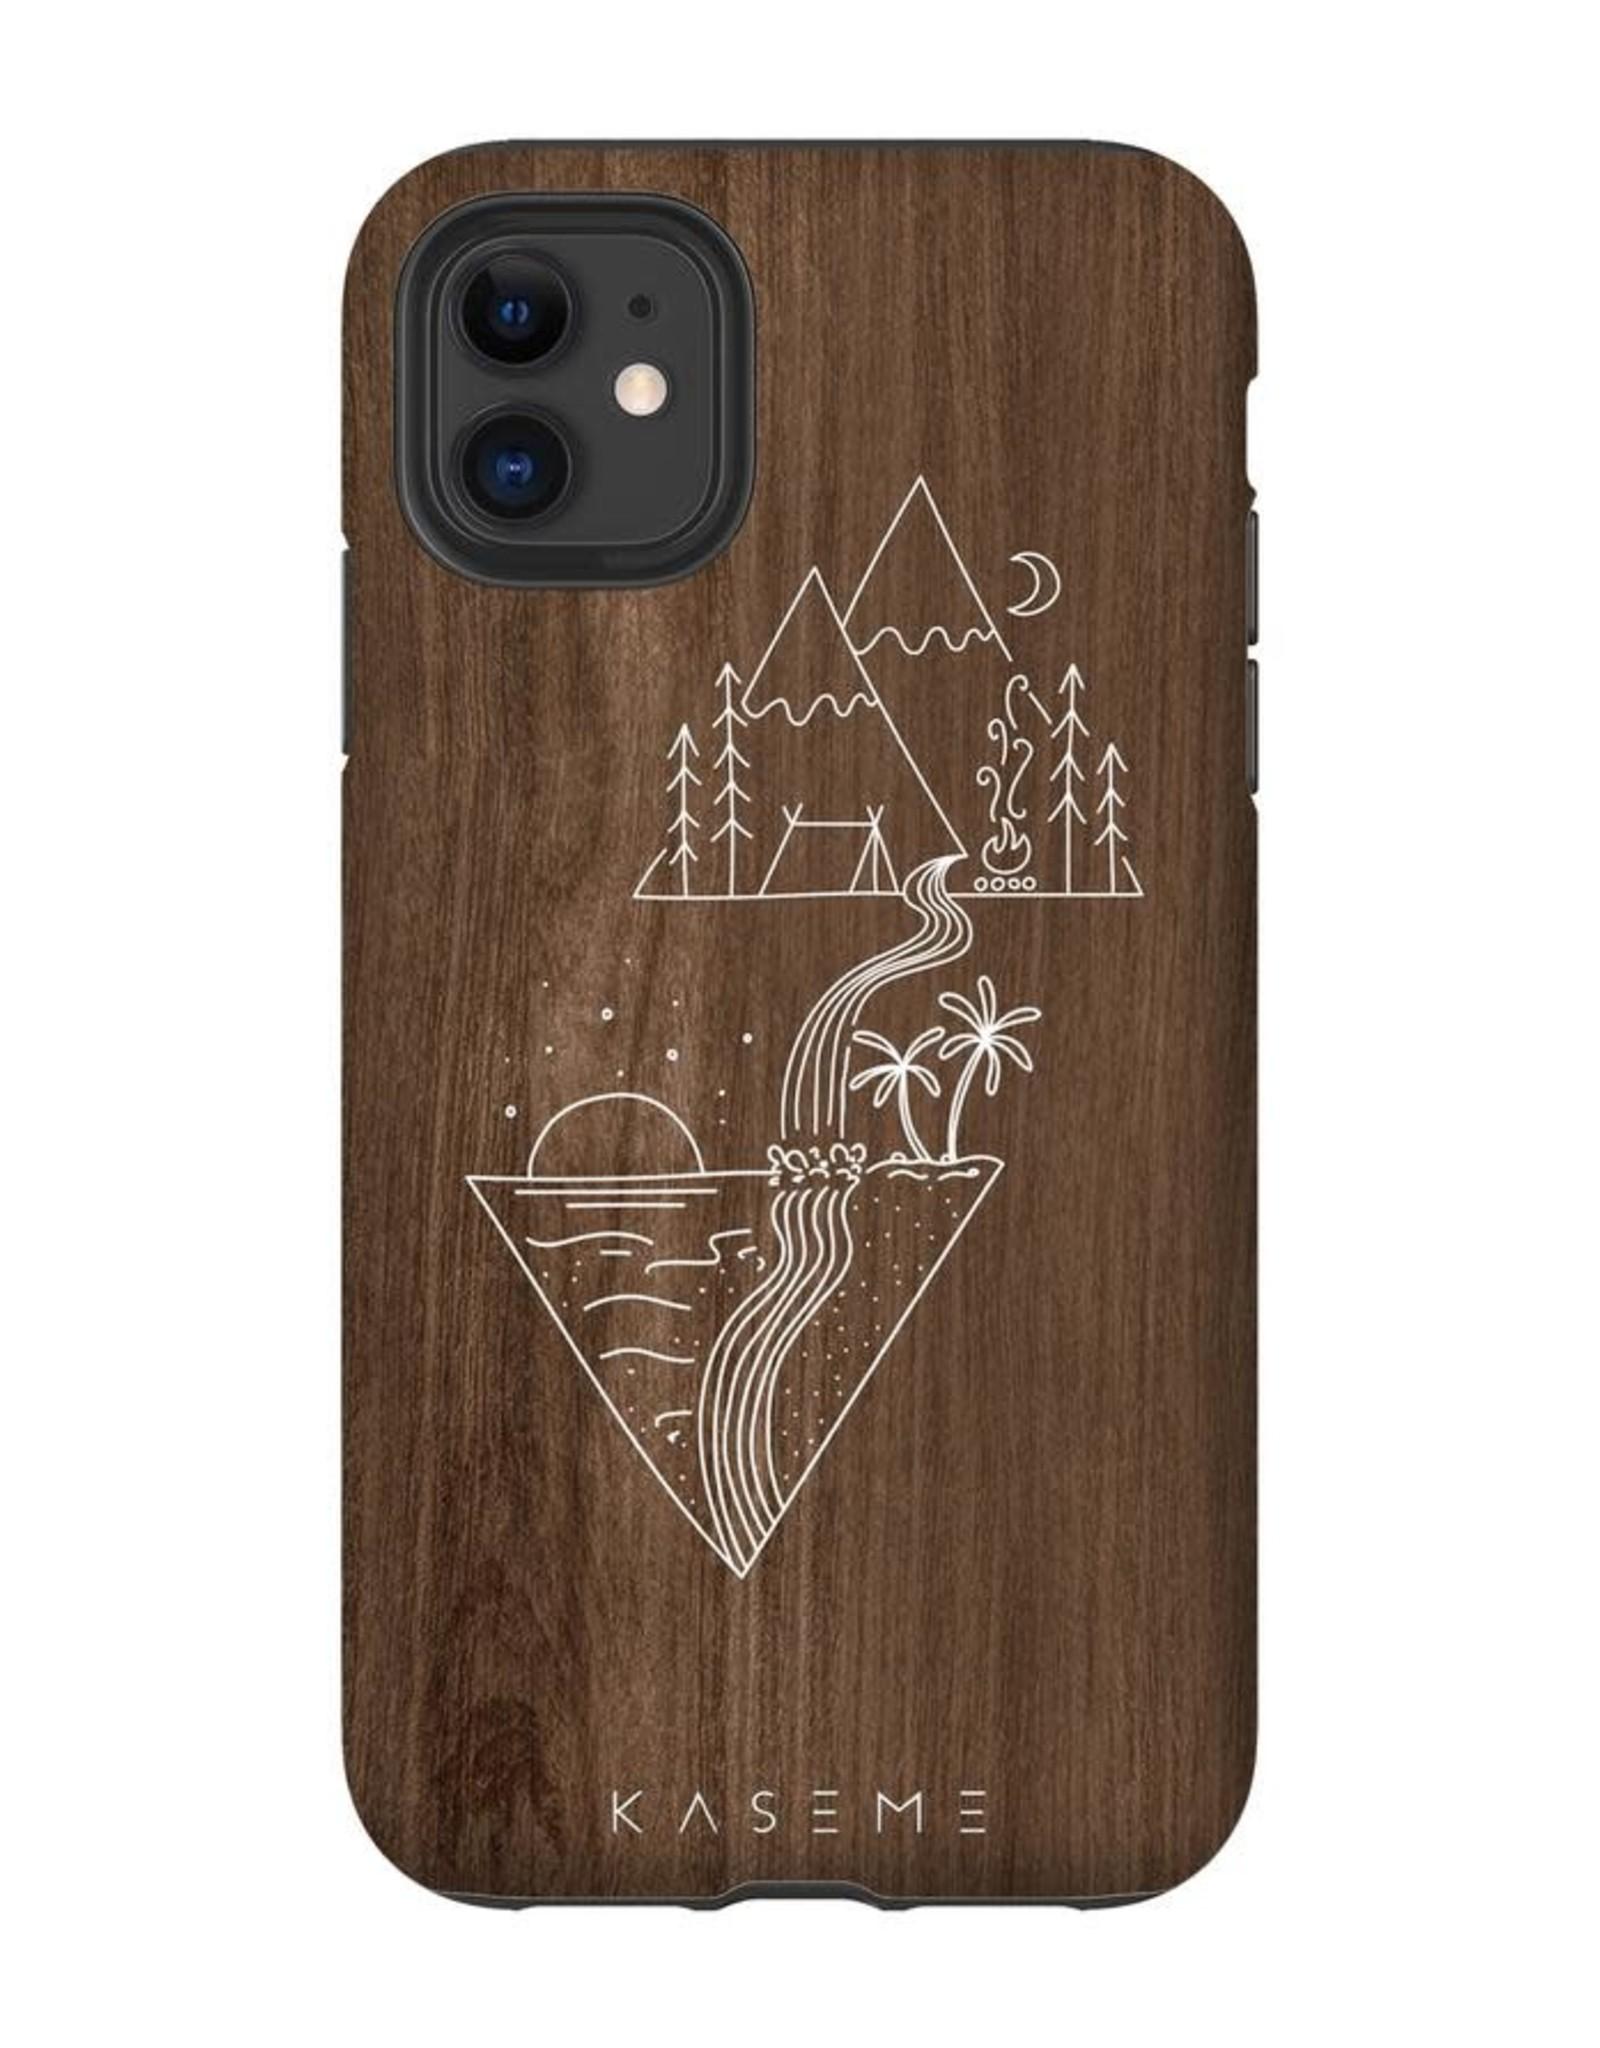 Kaseme Kaseme - Etui cellulaire IPhone biCoastal by kim